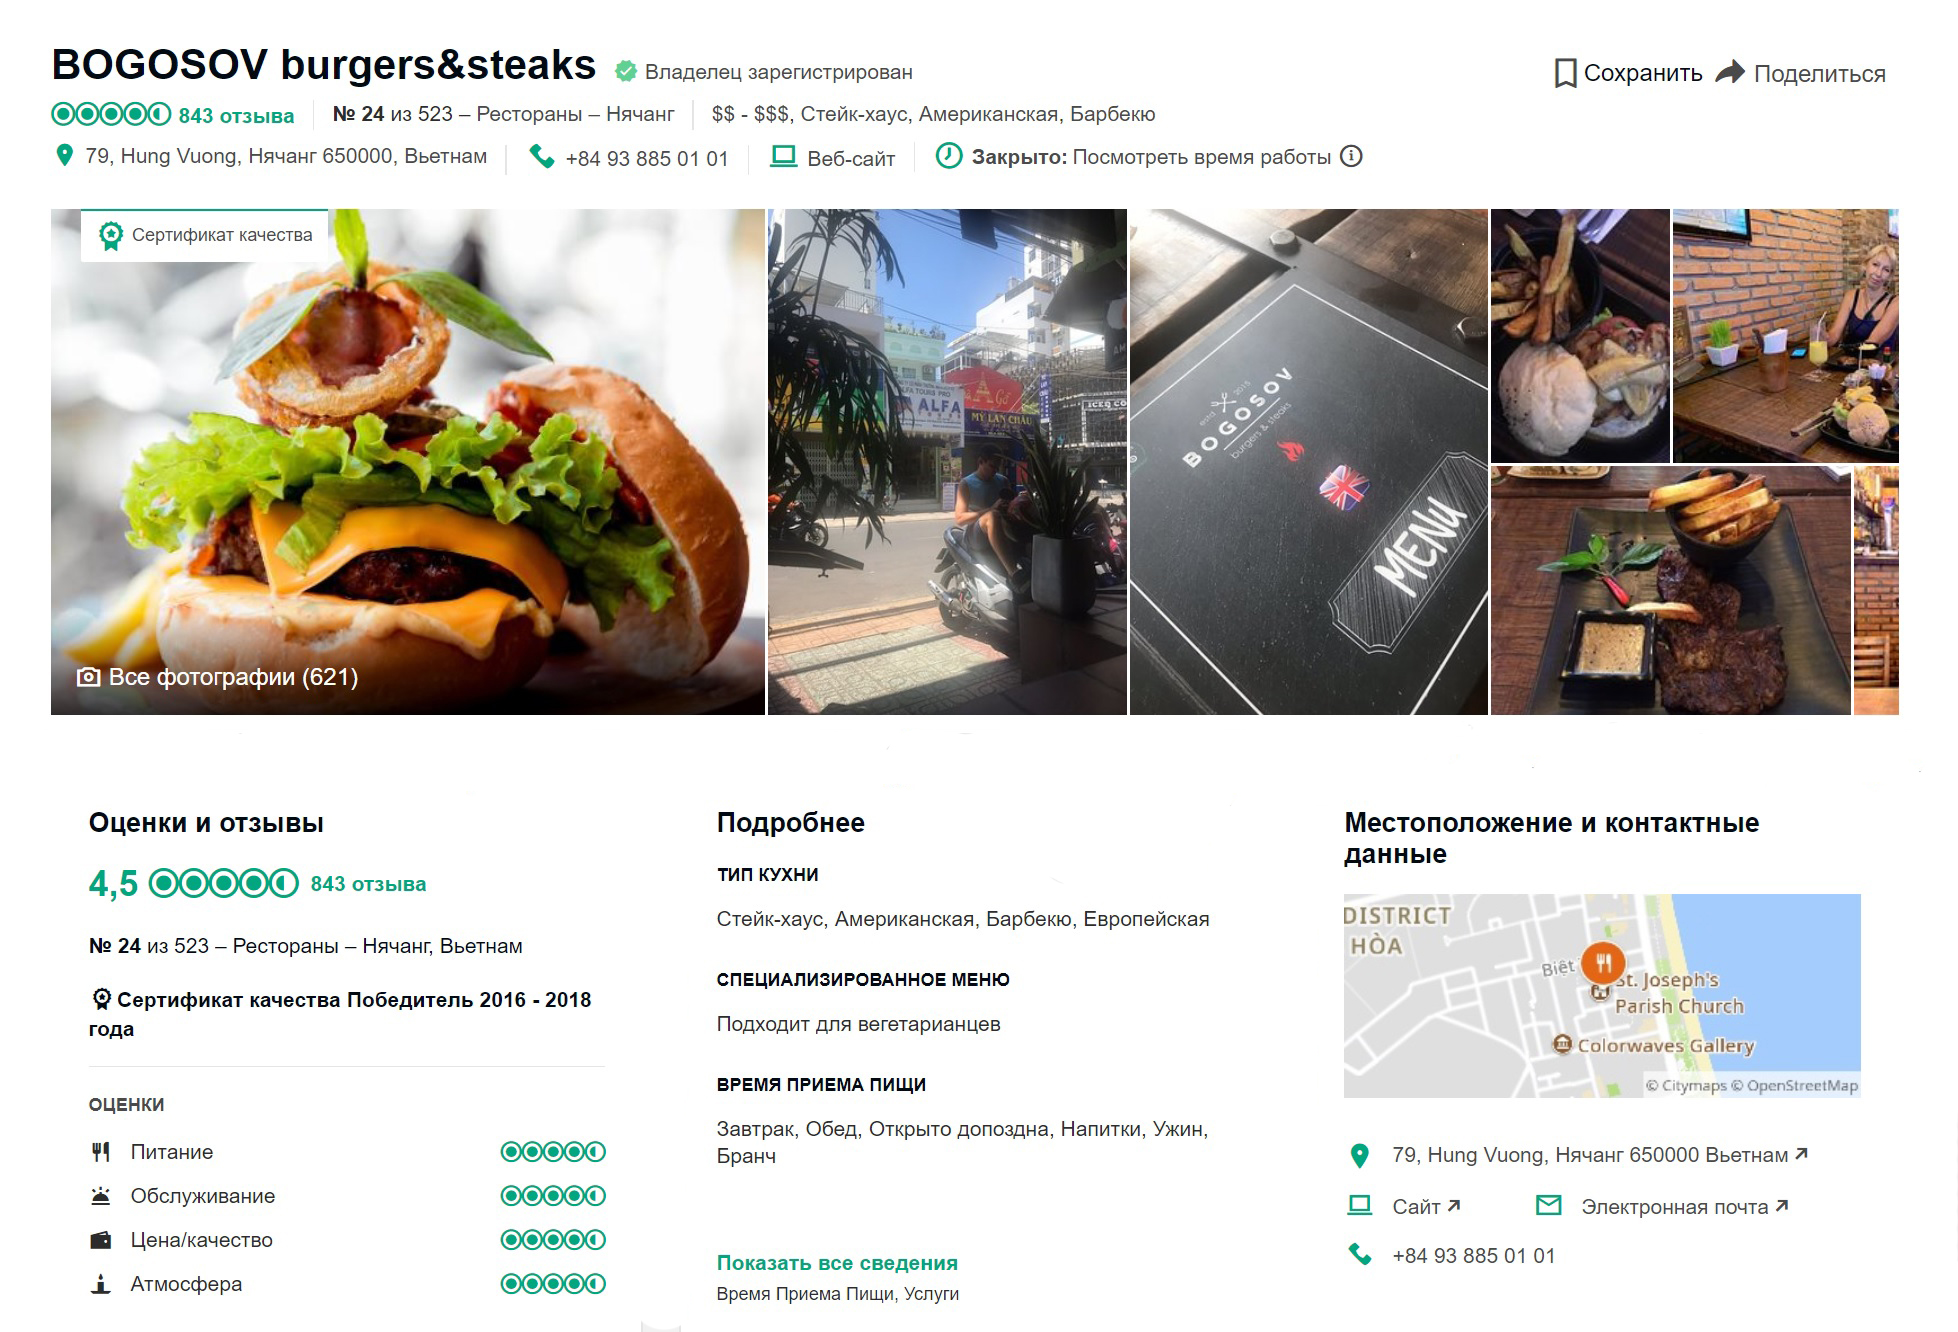 Bogosov_tripadvisor-4.jpg